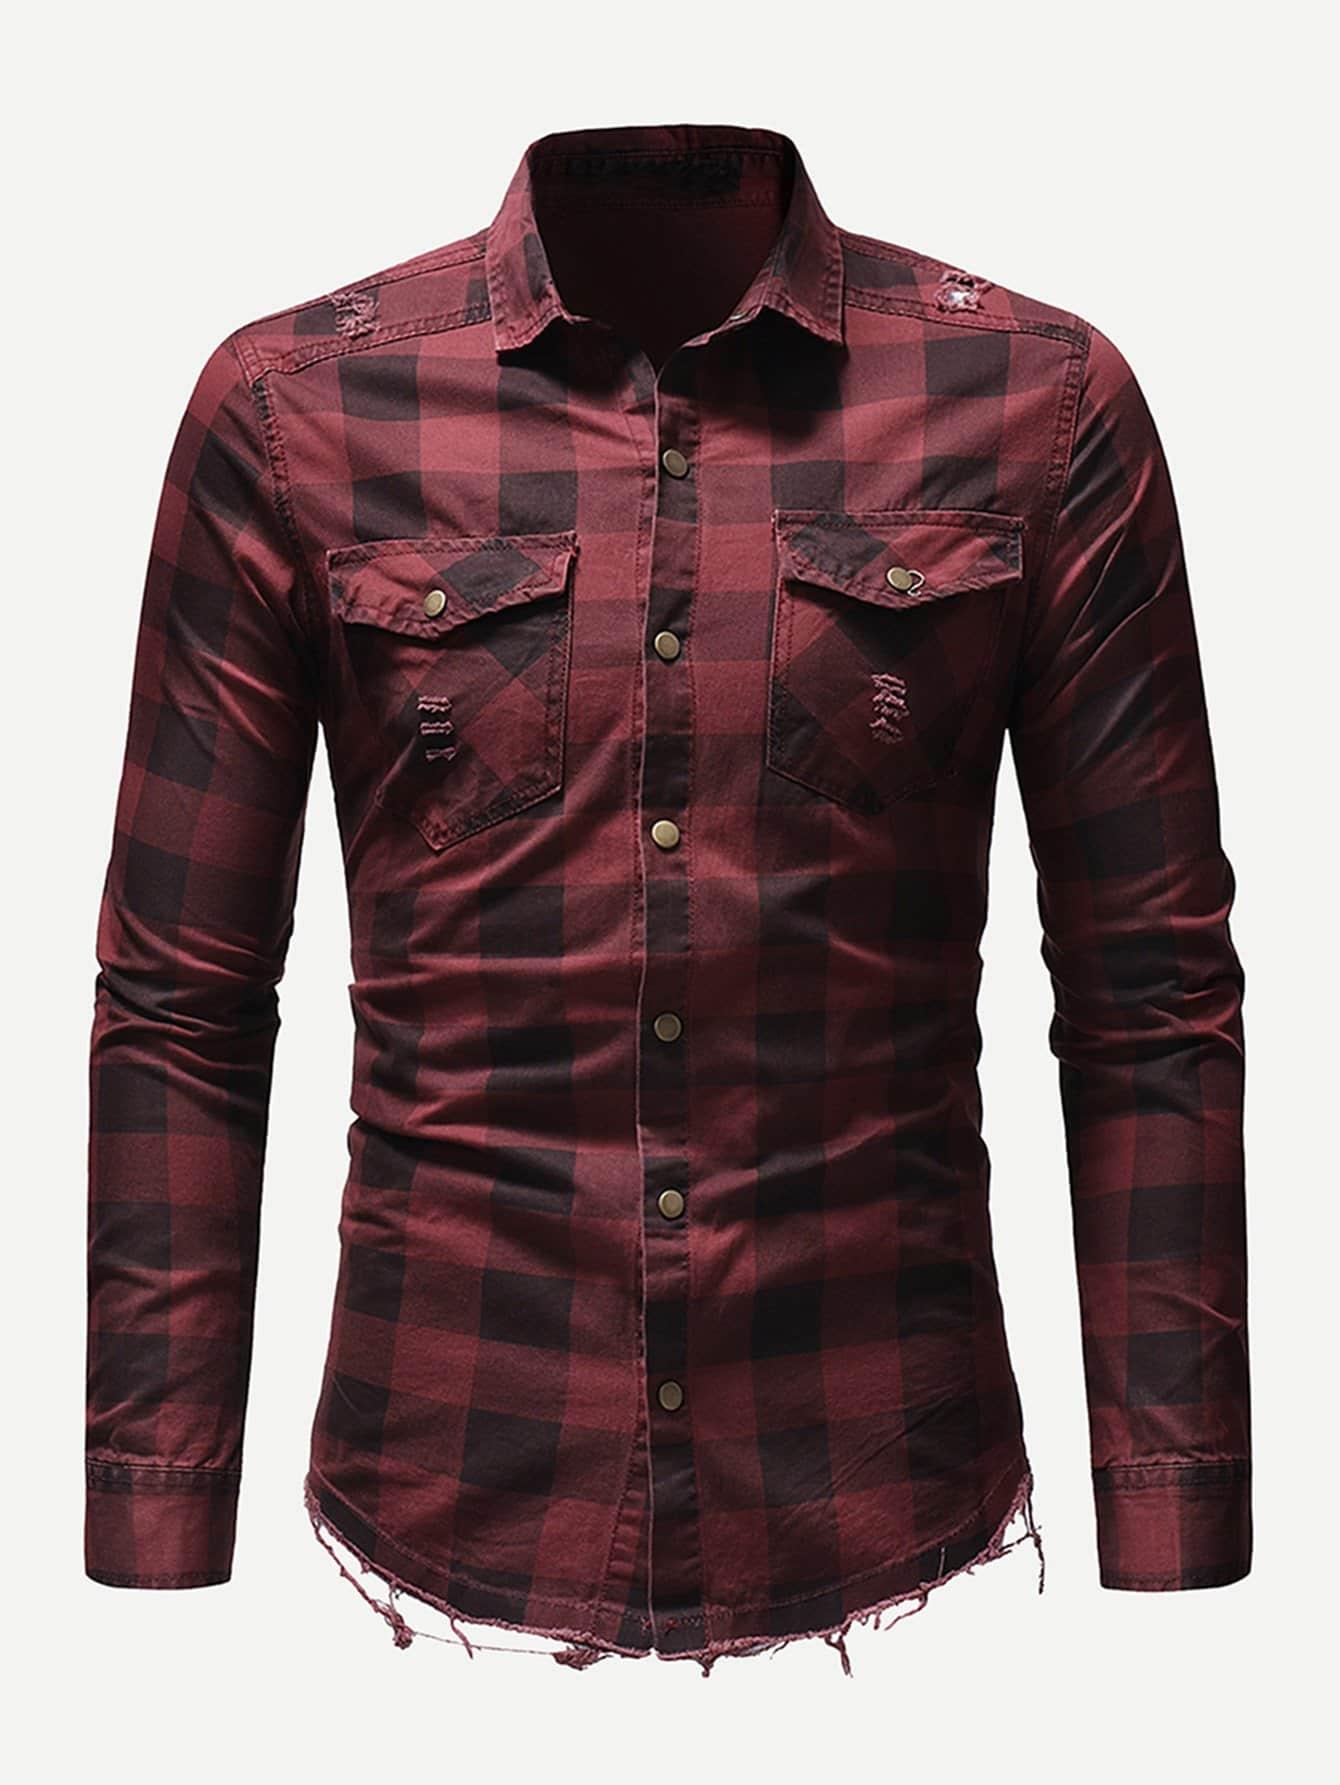 Men Ripped Detail Plaid Shirt Men Ripped Detail Plaid Shirt